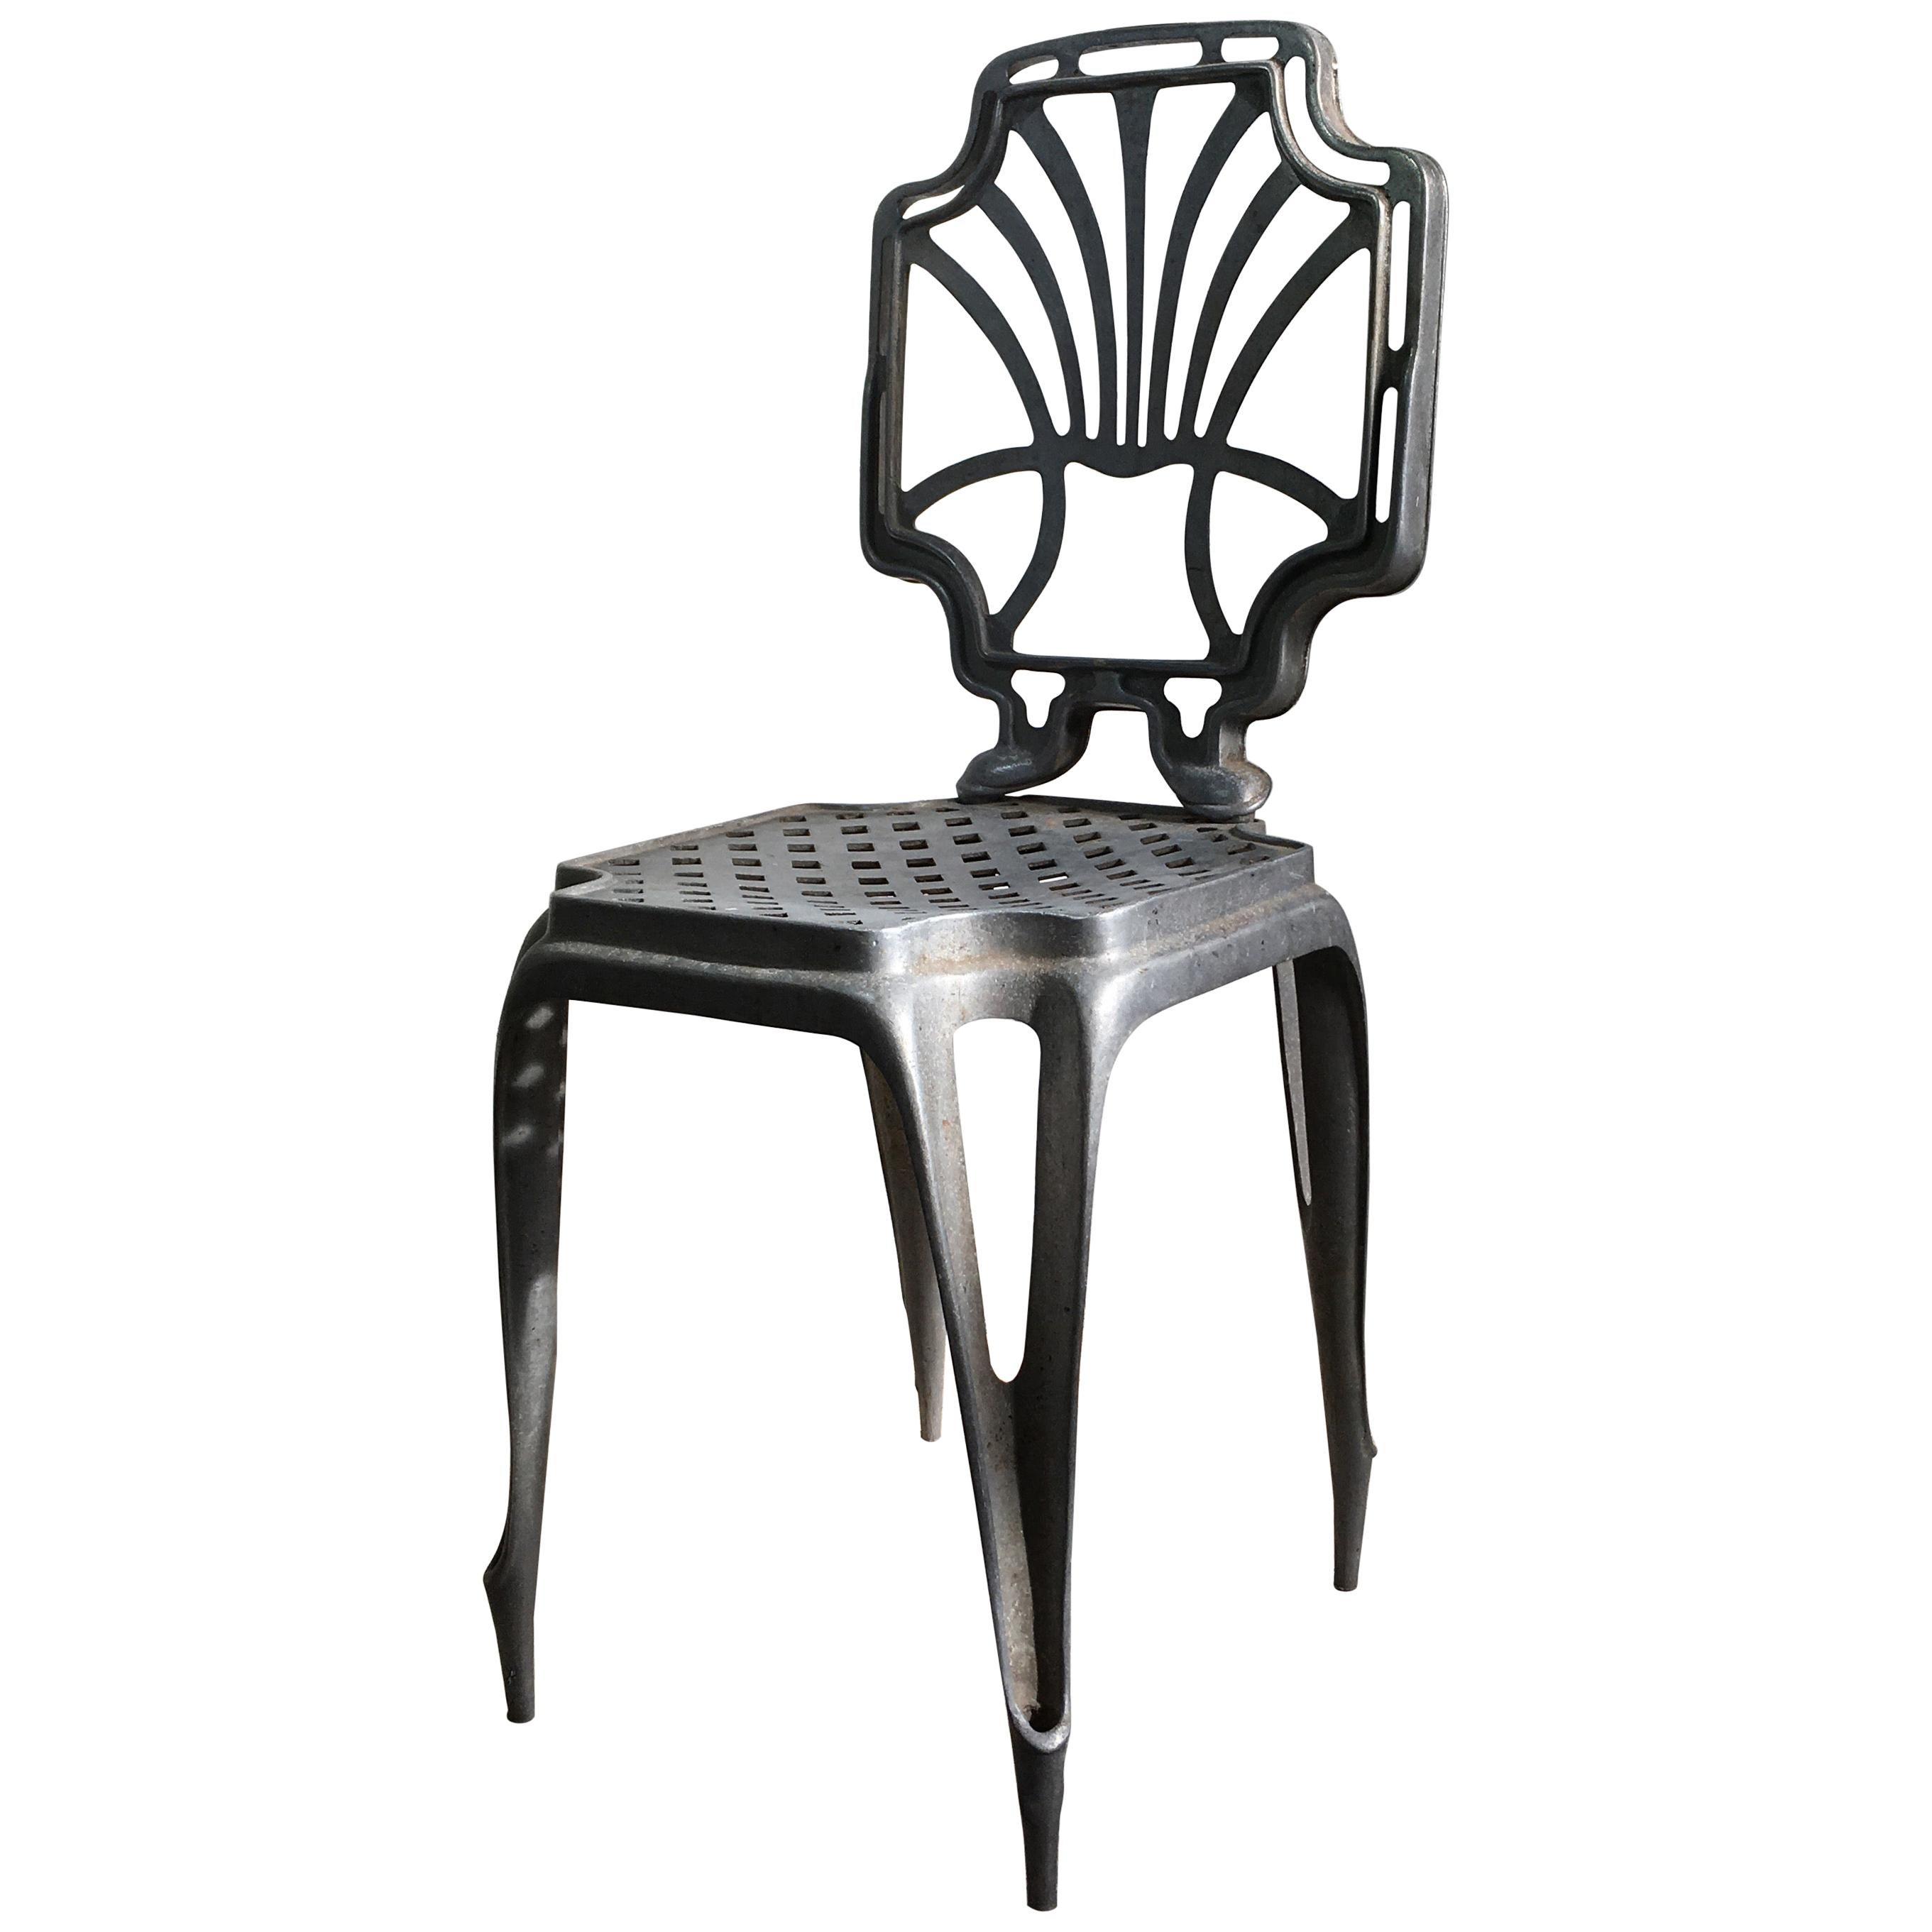 Joseph Mathieu Art Deco 'Multiples' Chair, 1920, France